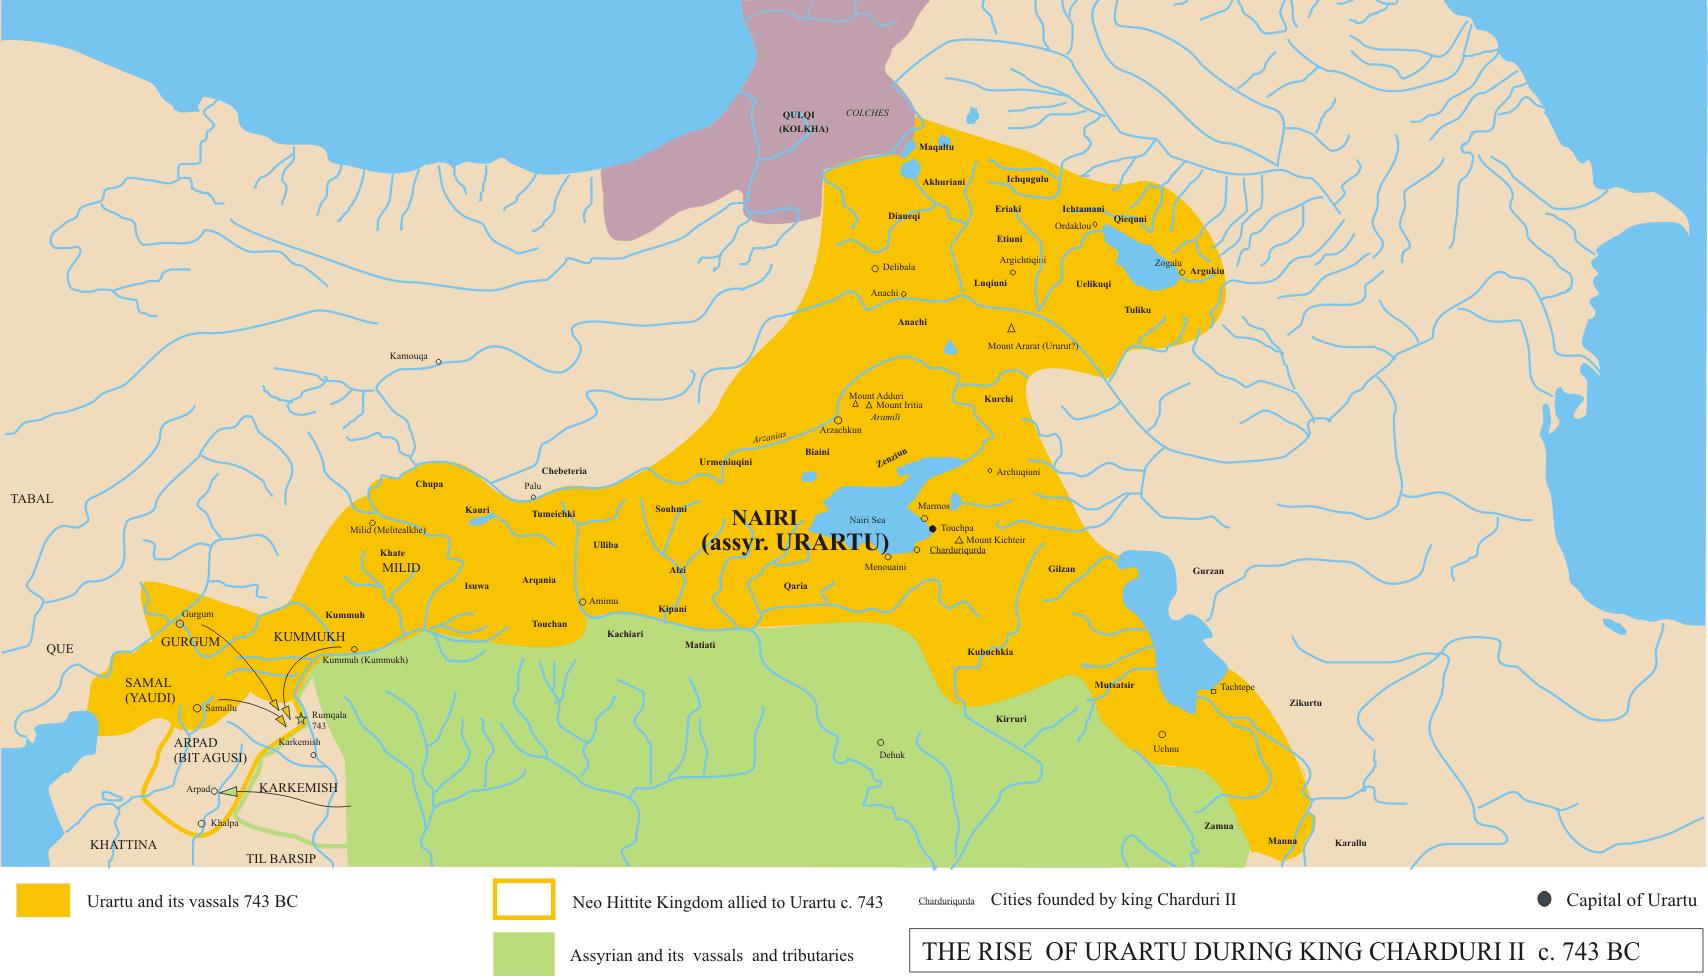 Urartu–yria War - Wikipedia on map of ancient greece, map of ancient babylonian, map of ancient india, map of ancient kingdom of judah, map of ancient elam, map of ancient galatia, map of ancient babylon, map of ancient eridu, map of ancient cyprus, map of ancient borsippa, map of ancient ecbatana, map of ancient colchis, map of ancient axum, map of ancient parthia, map of ancient susa, map of ancient cumae, map of ancient etruscan civilization, map of ancient uruk, map of ancient han dynasty, map of ancient pontus,